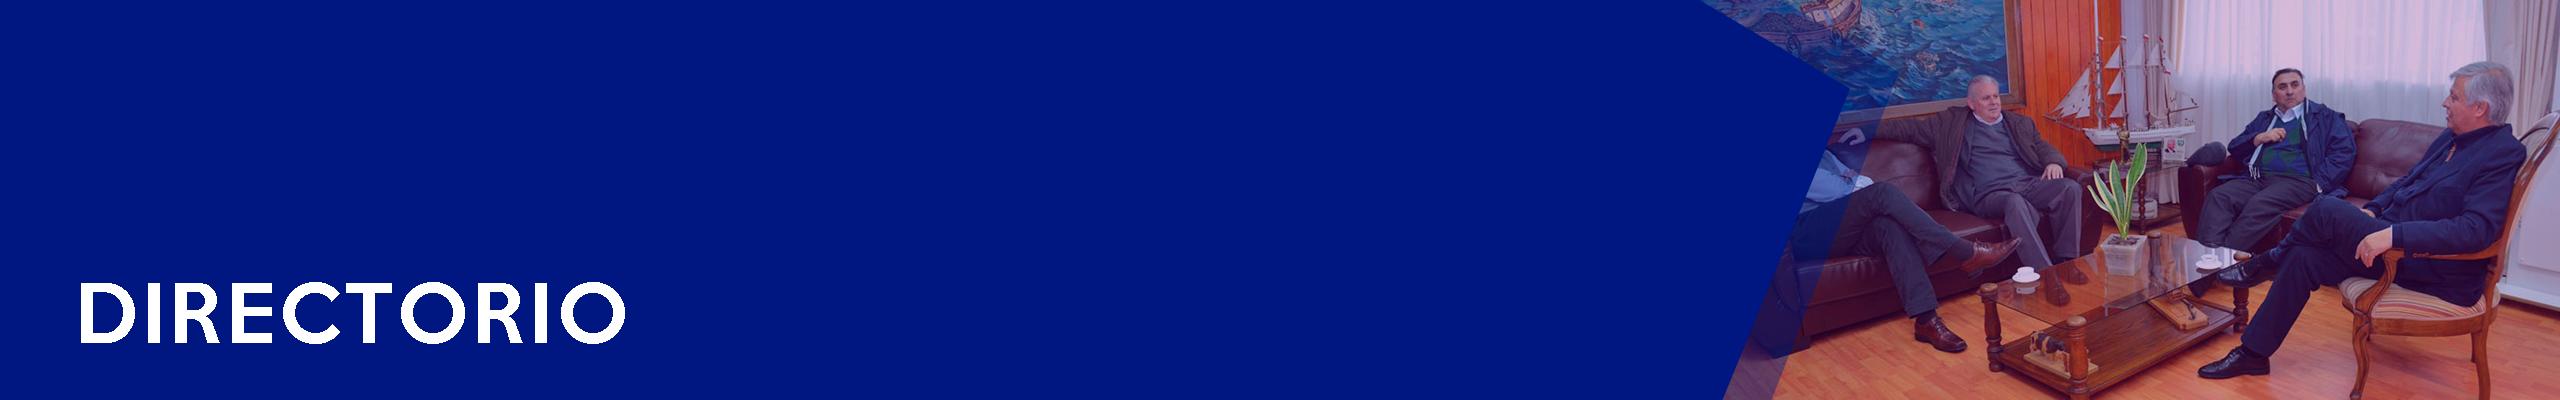 cabecera-directorio